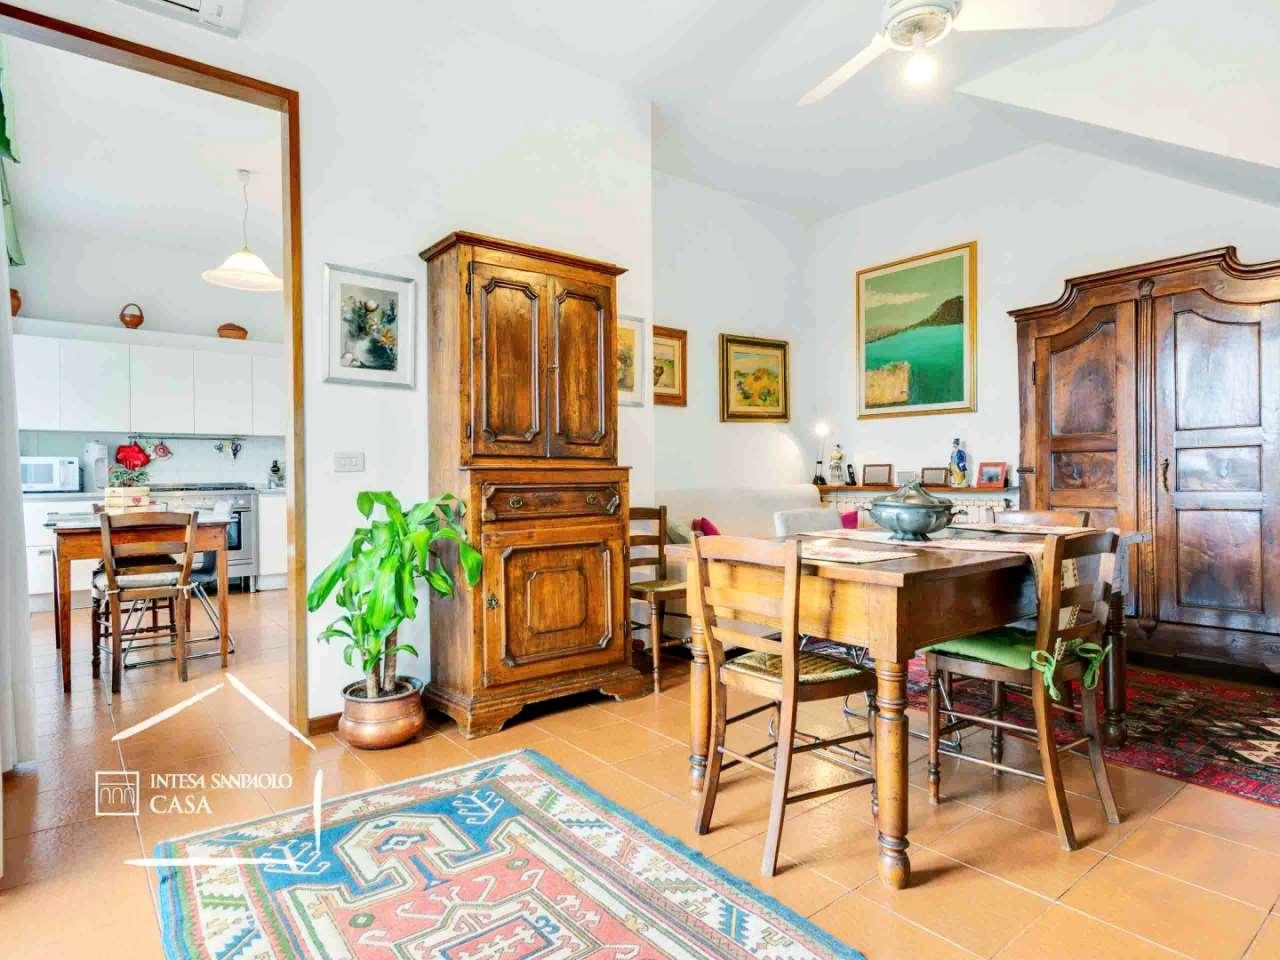 Attico in Vendita a Firenze: 5 locali, 275 mq - Foto 8